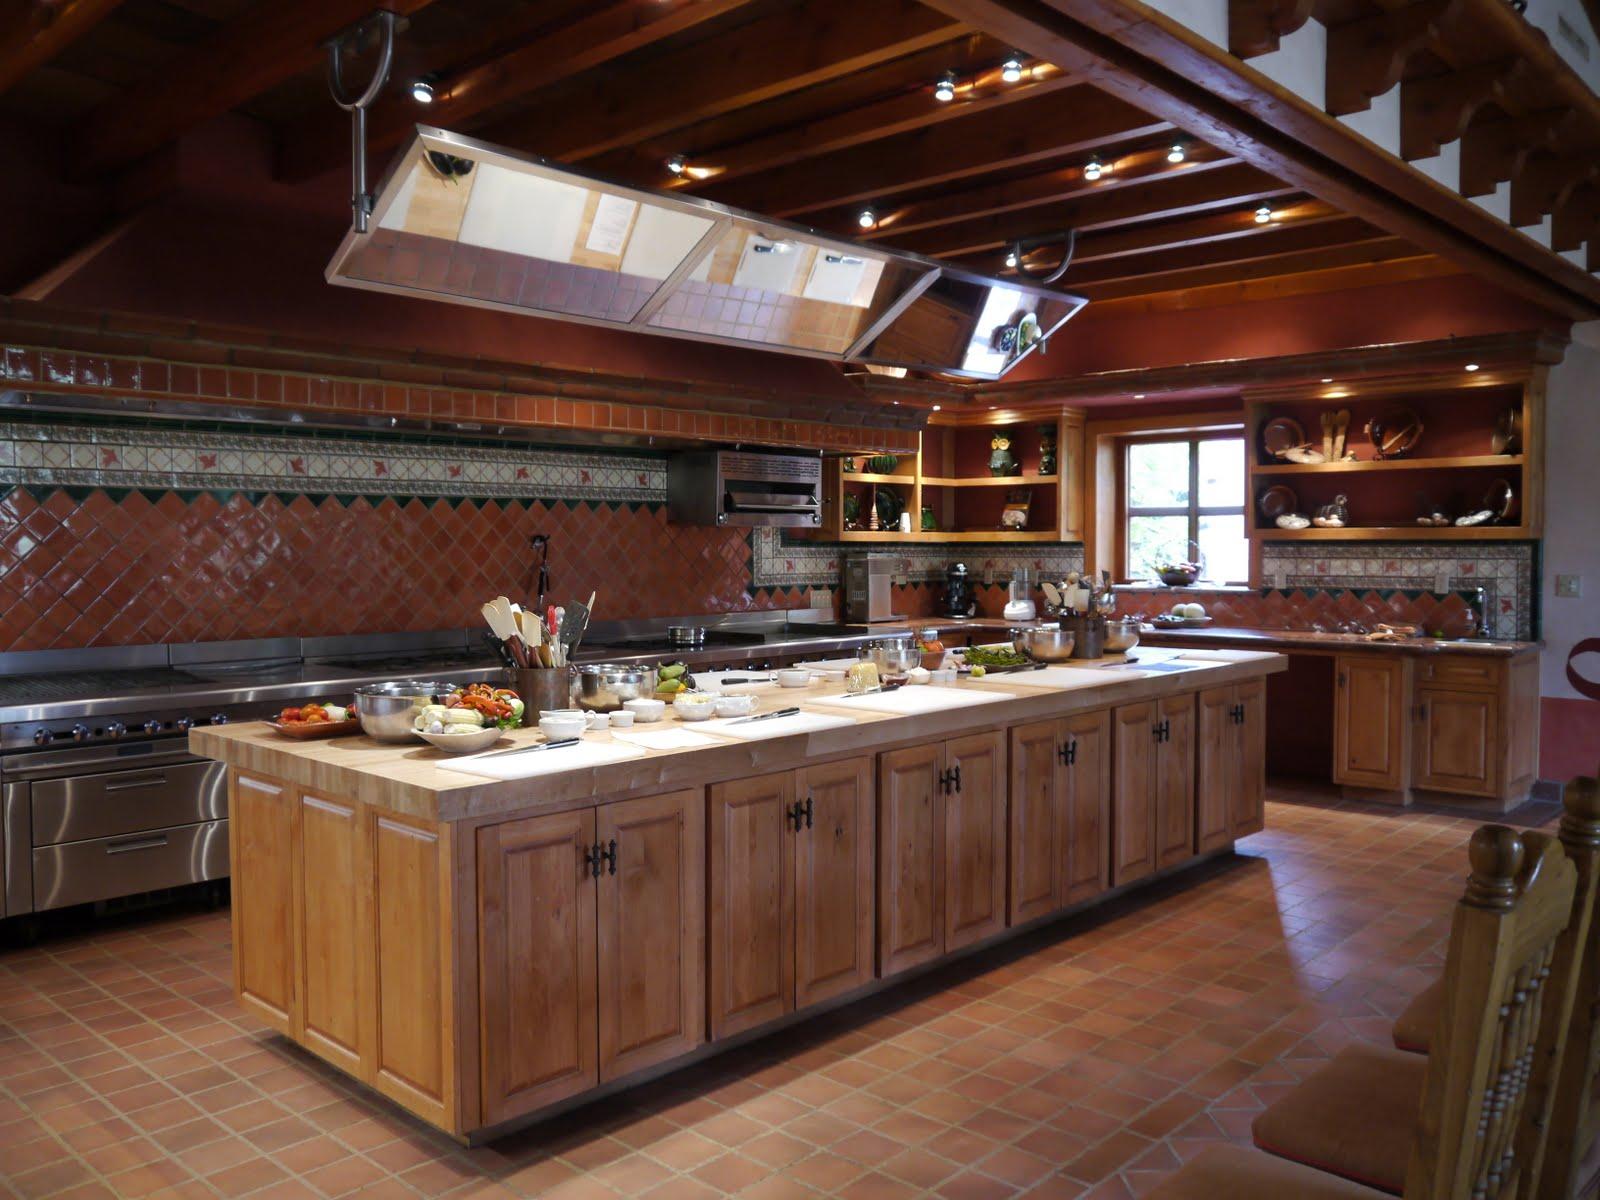 Cucina Divina La Cocina Que Canta The Kitchen That Sings